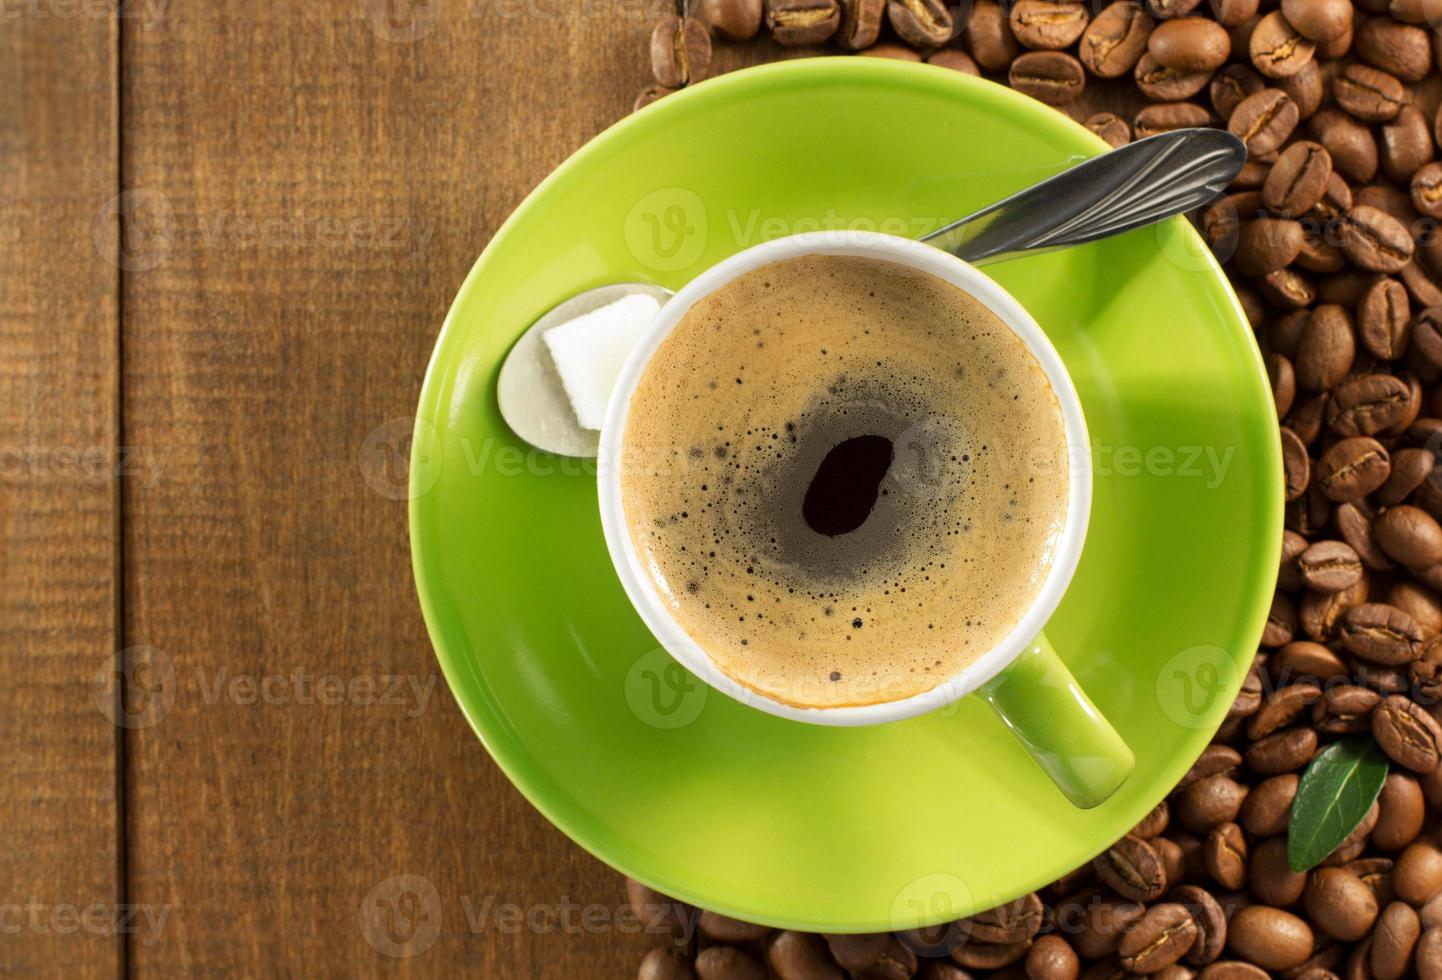 taza de café en madera foto